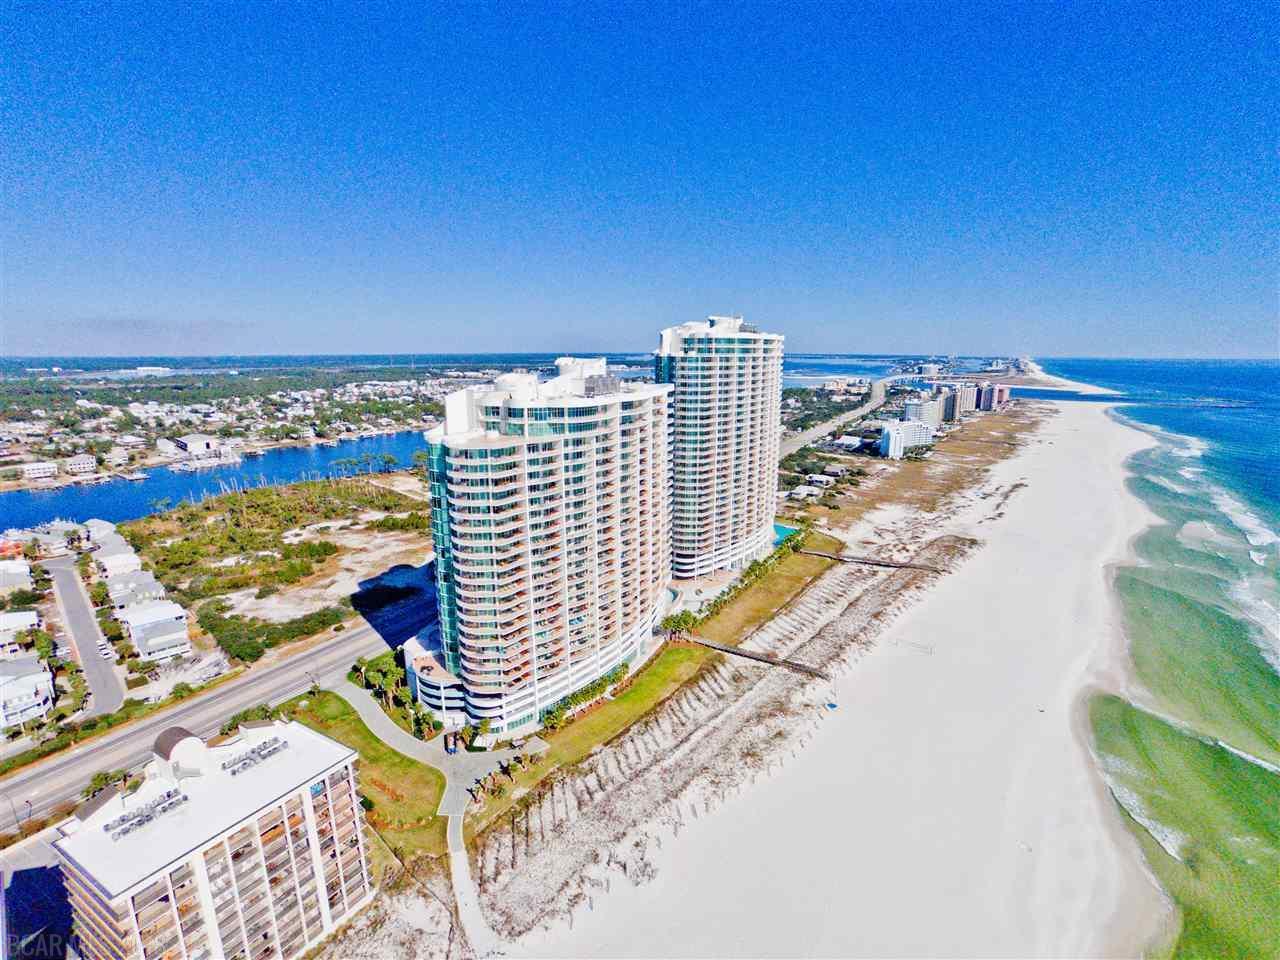 Orange Beach Alabama Resort Condo For Sale, Turquoise Place